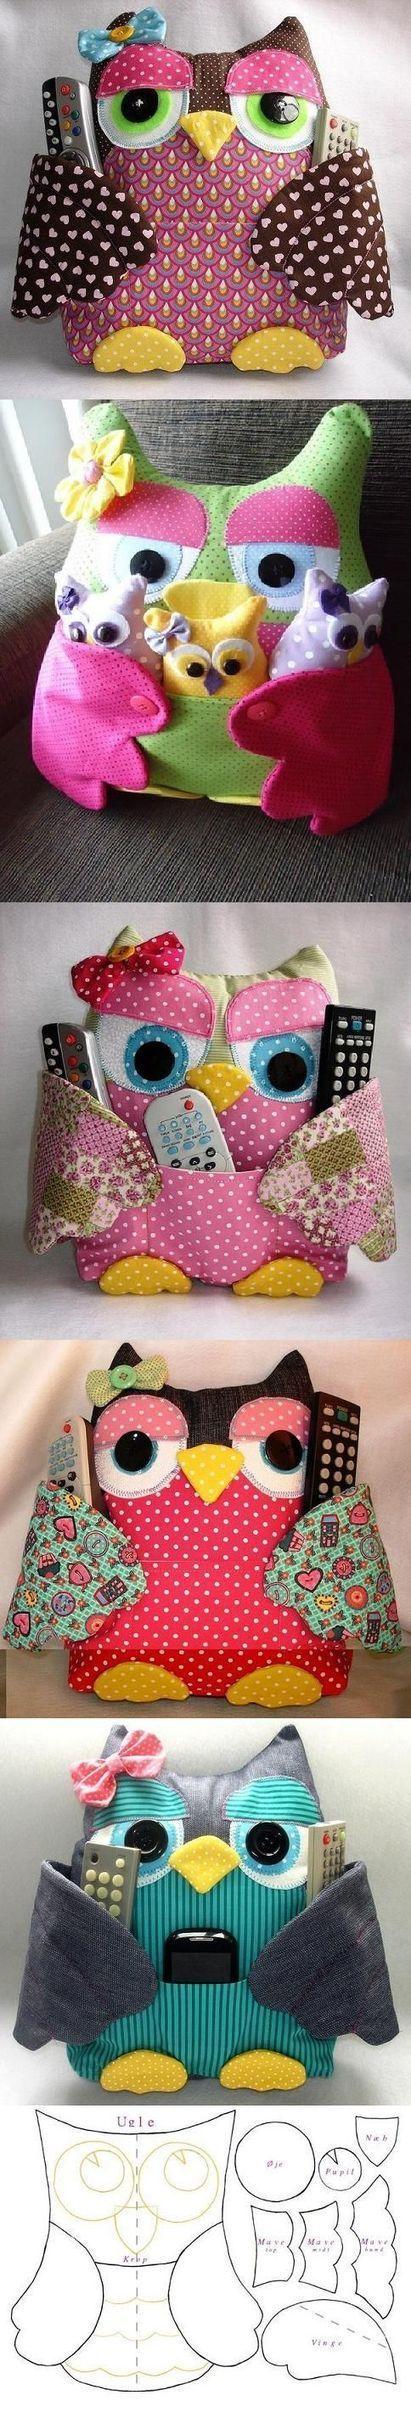 Crafty Crafts | Crafty Crafts-all free | Scoop.it